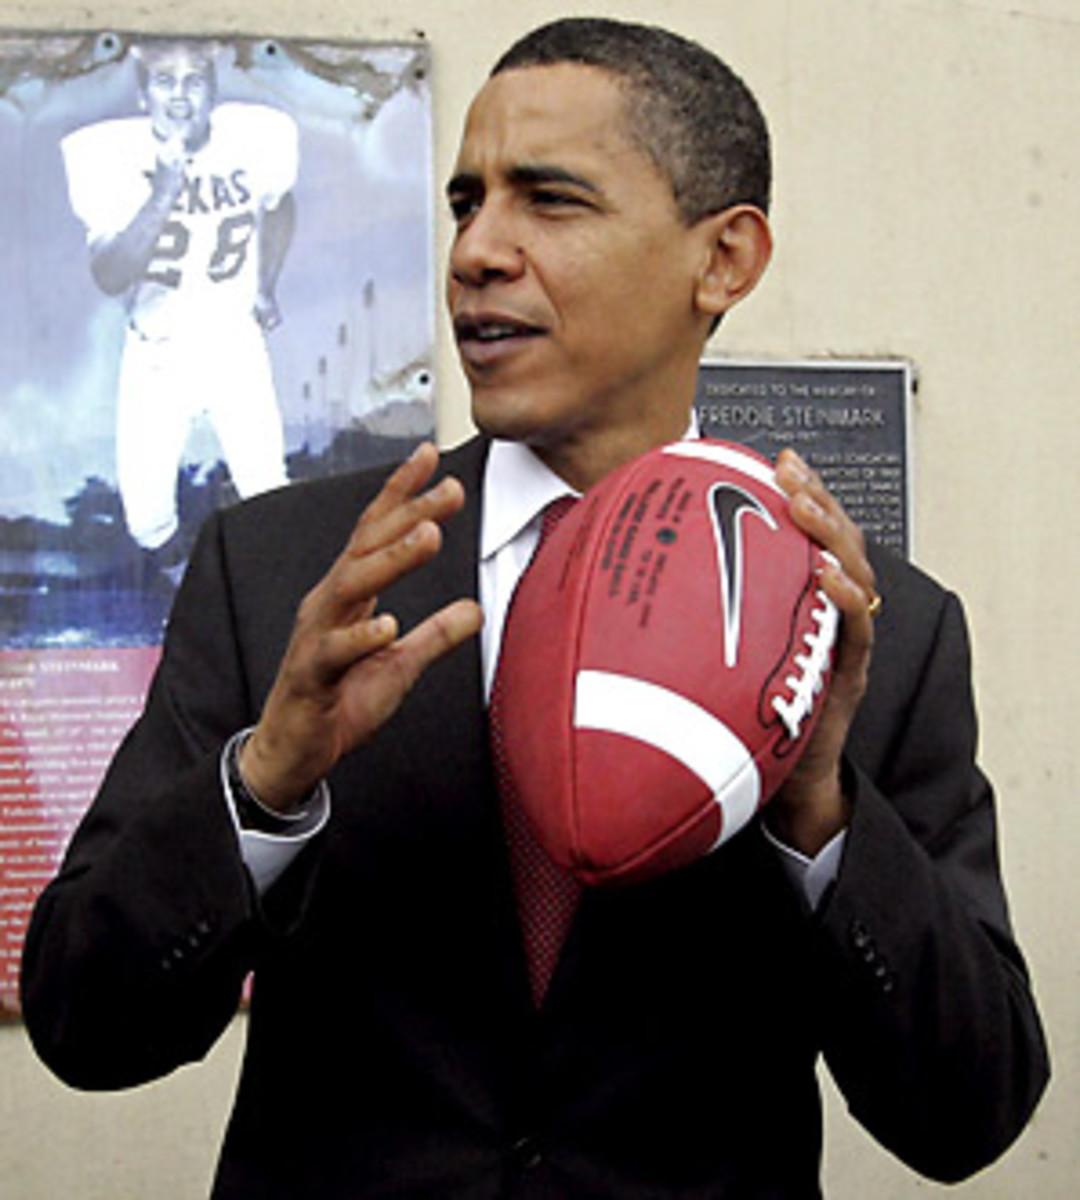 obama-bcs-p1.jpg